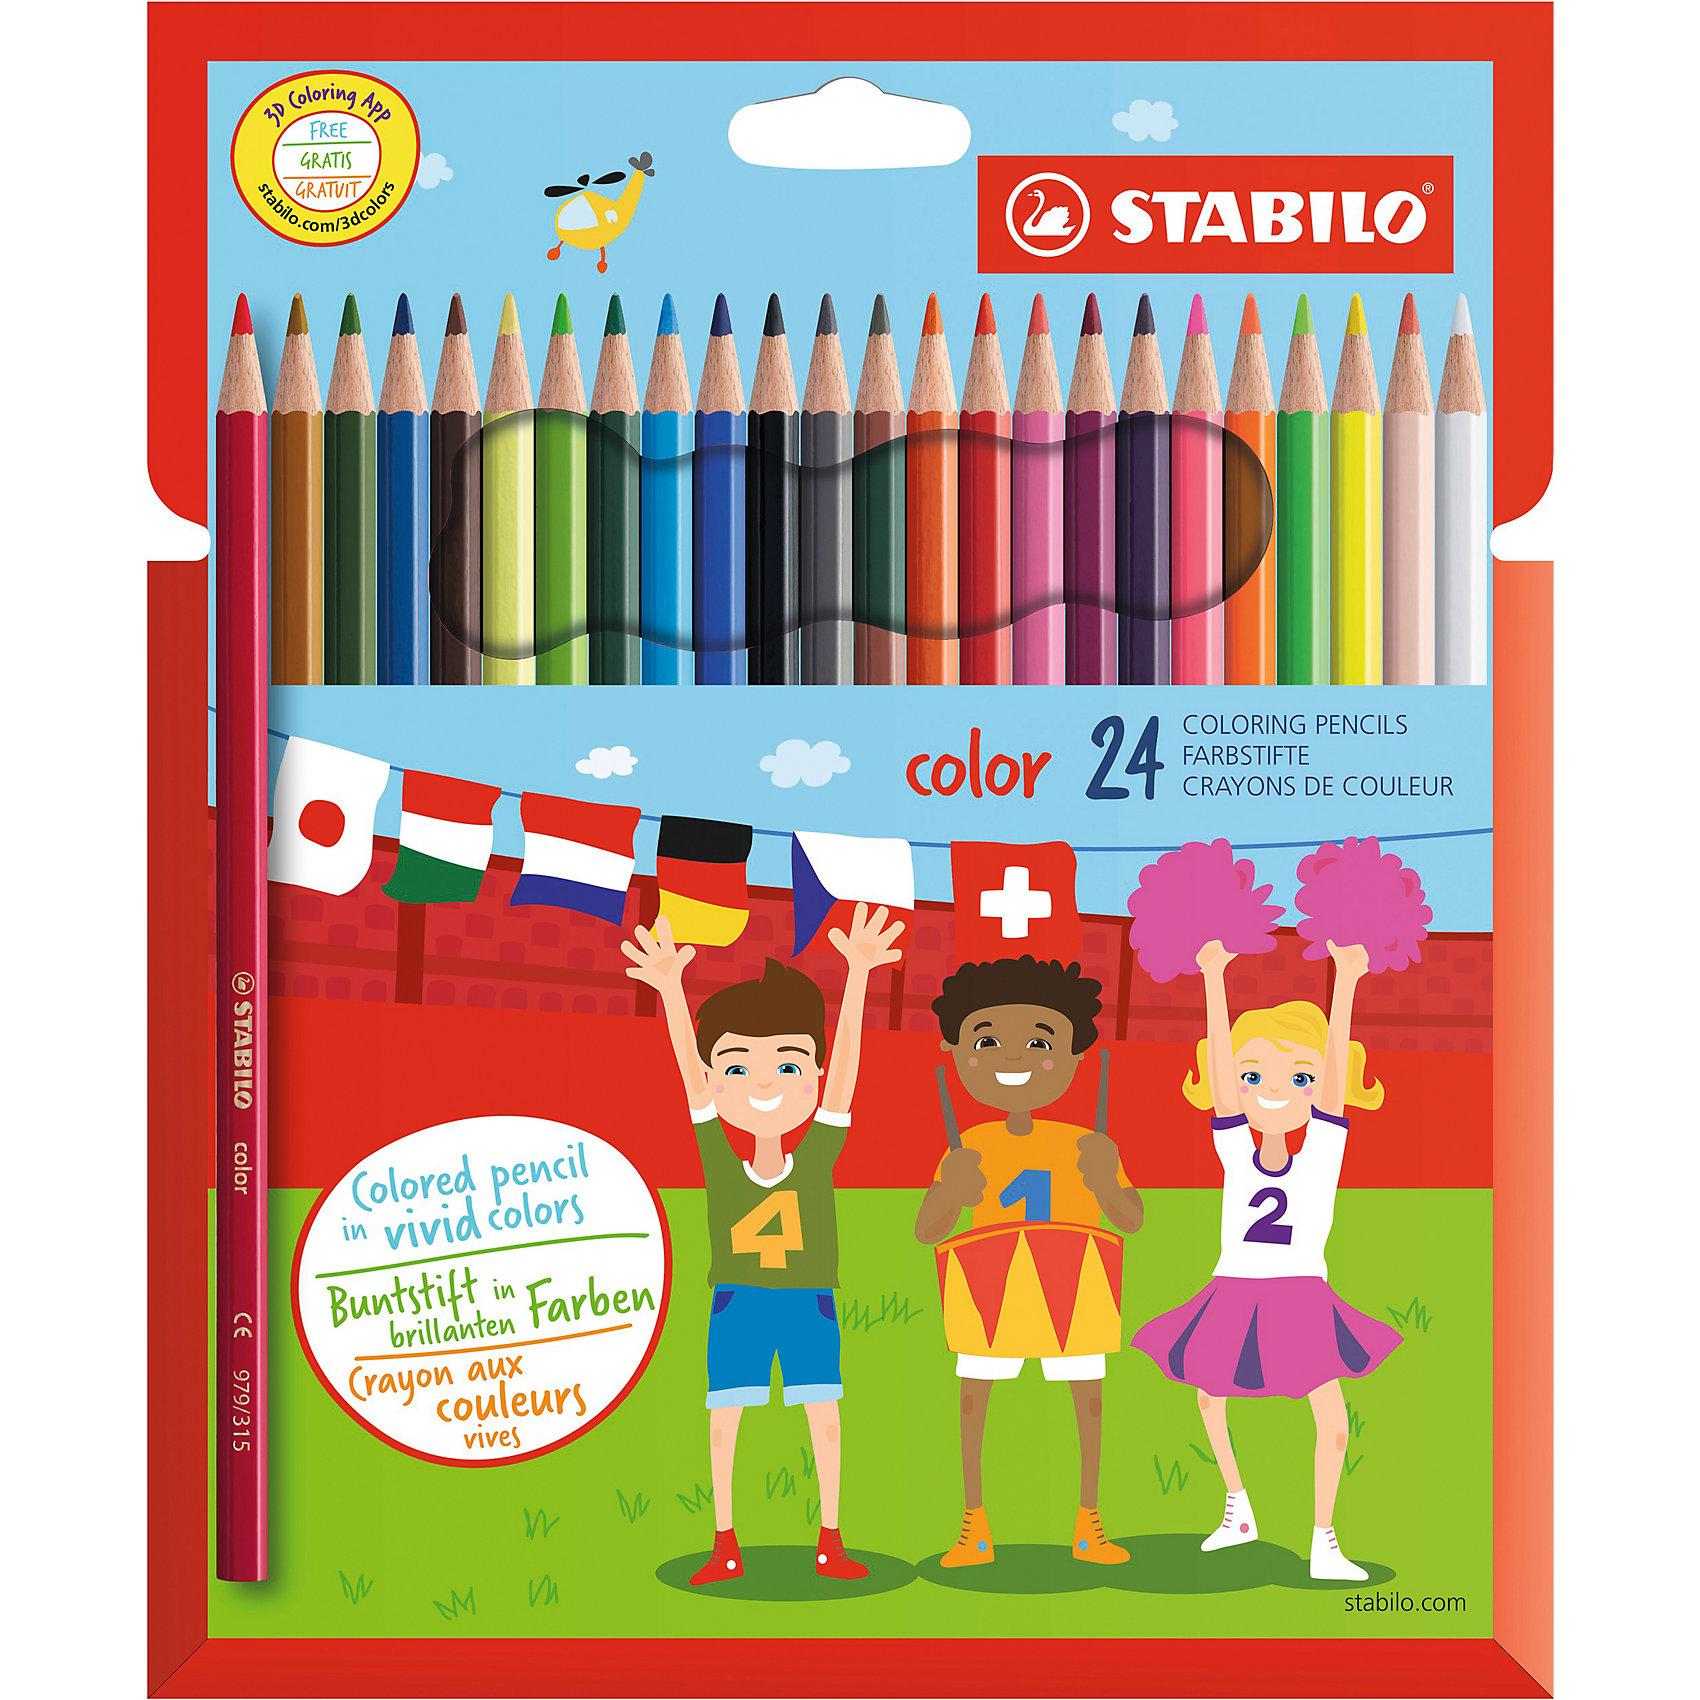 STABILO Набор цветных карандашей 24 цв. набор цветных карандашей maped color peps 12 шт 683212 в тубусе подставке